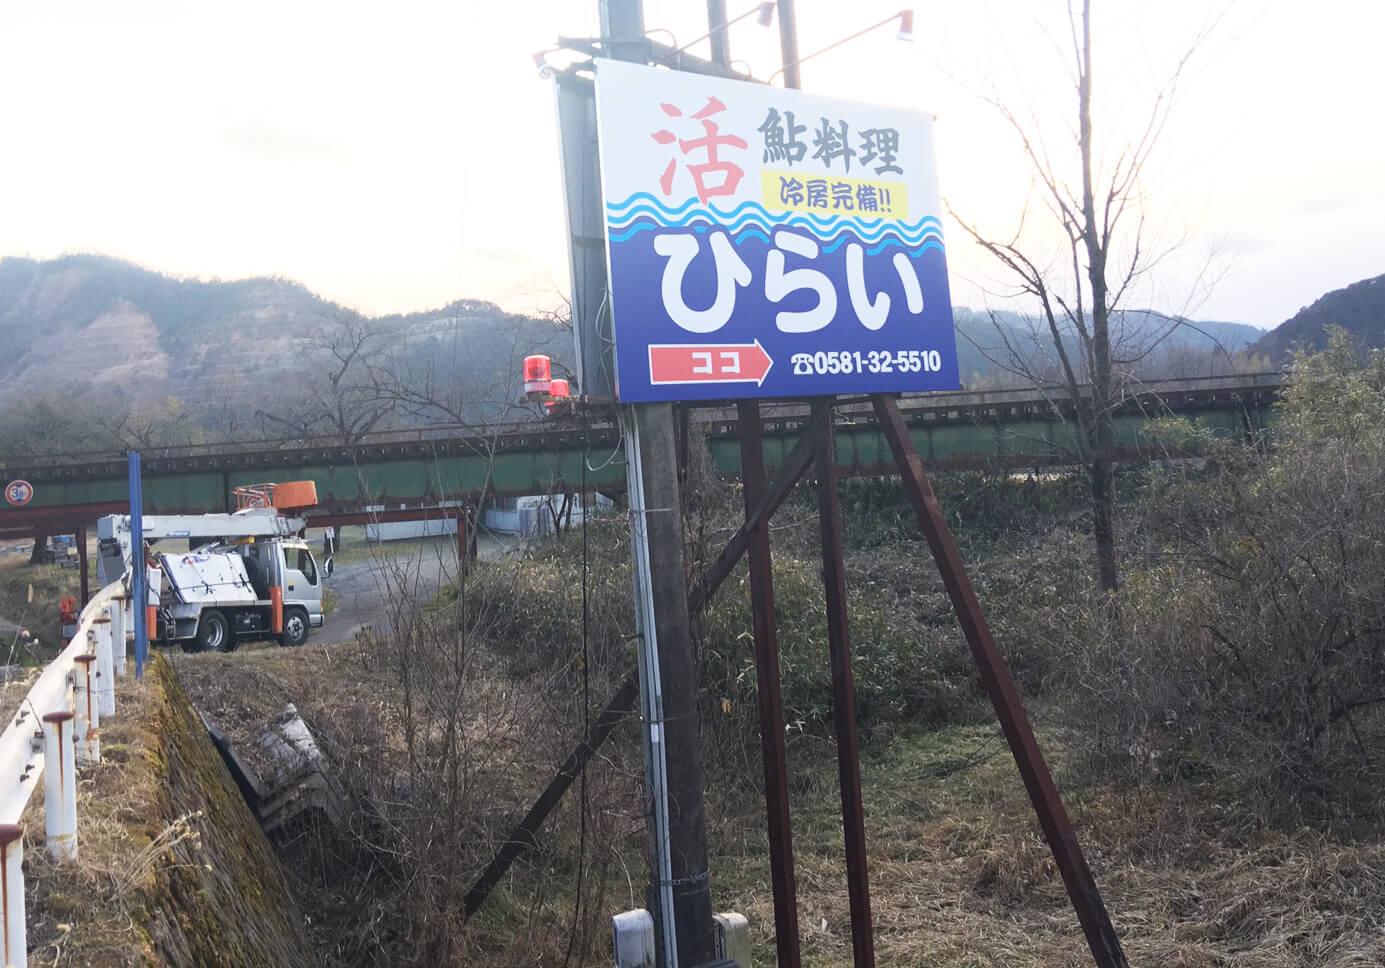 IMG 4792 - 【岐阜県本巣市】ヤナ飲食店様の野立て看板の設置を担当しました。